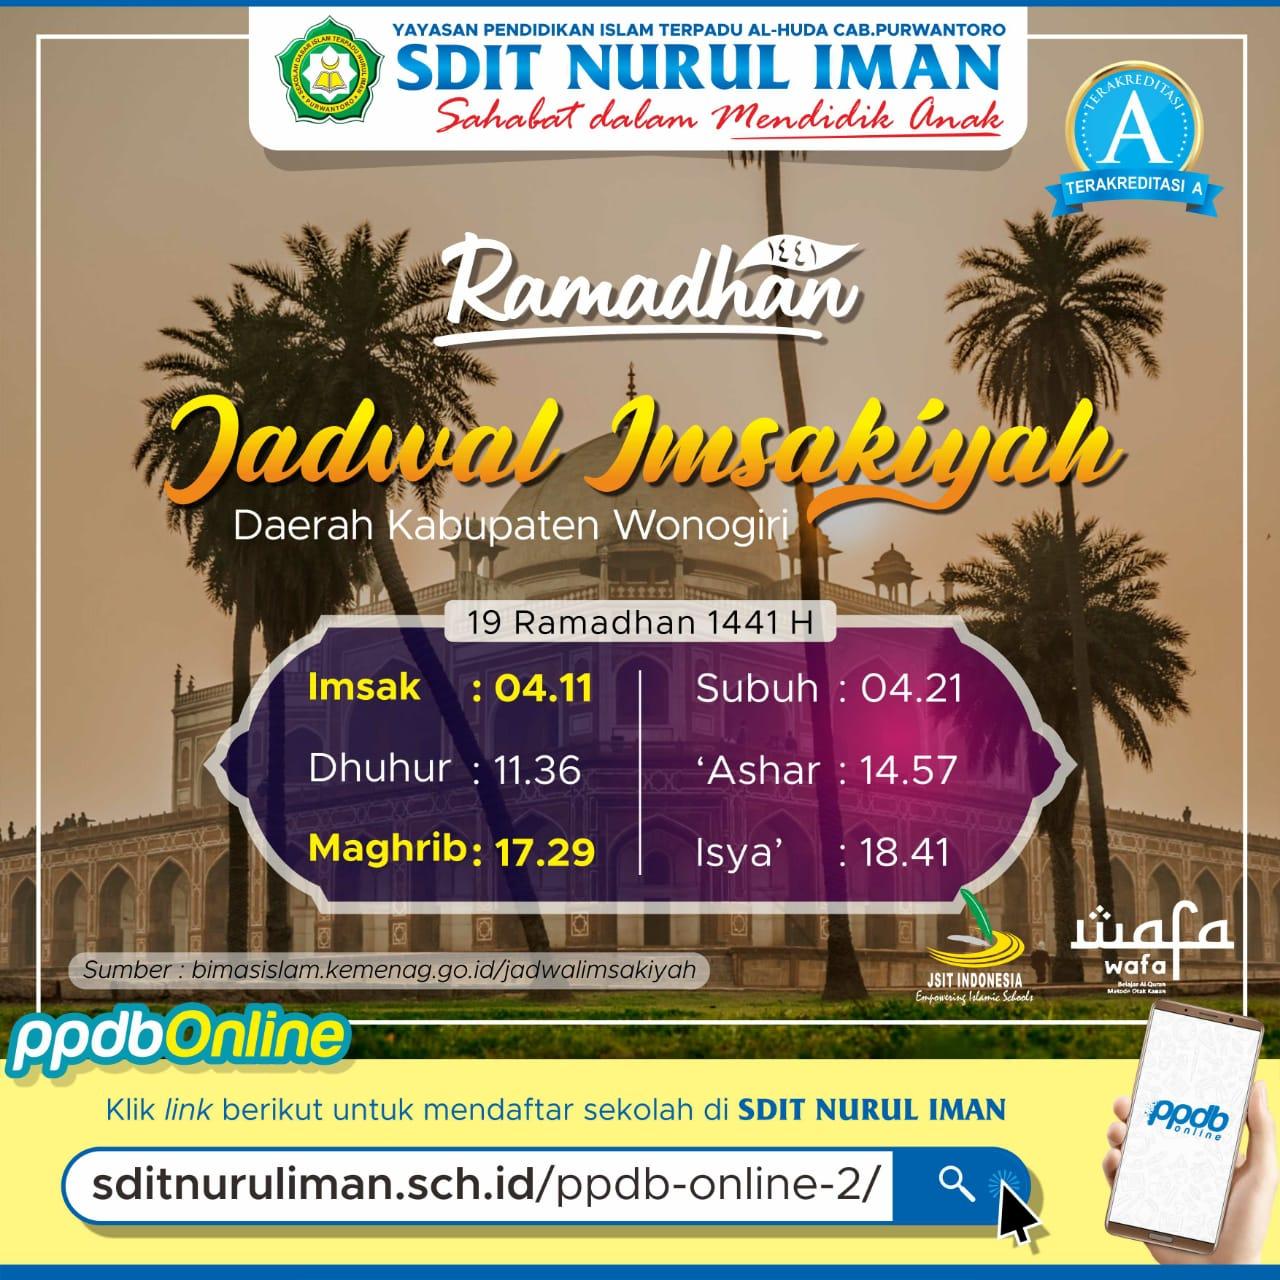 19 Ramadhan 1441 H